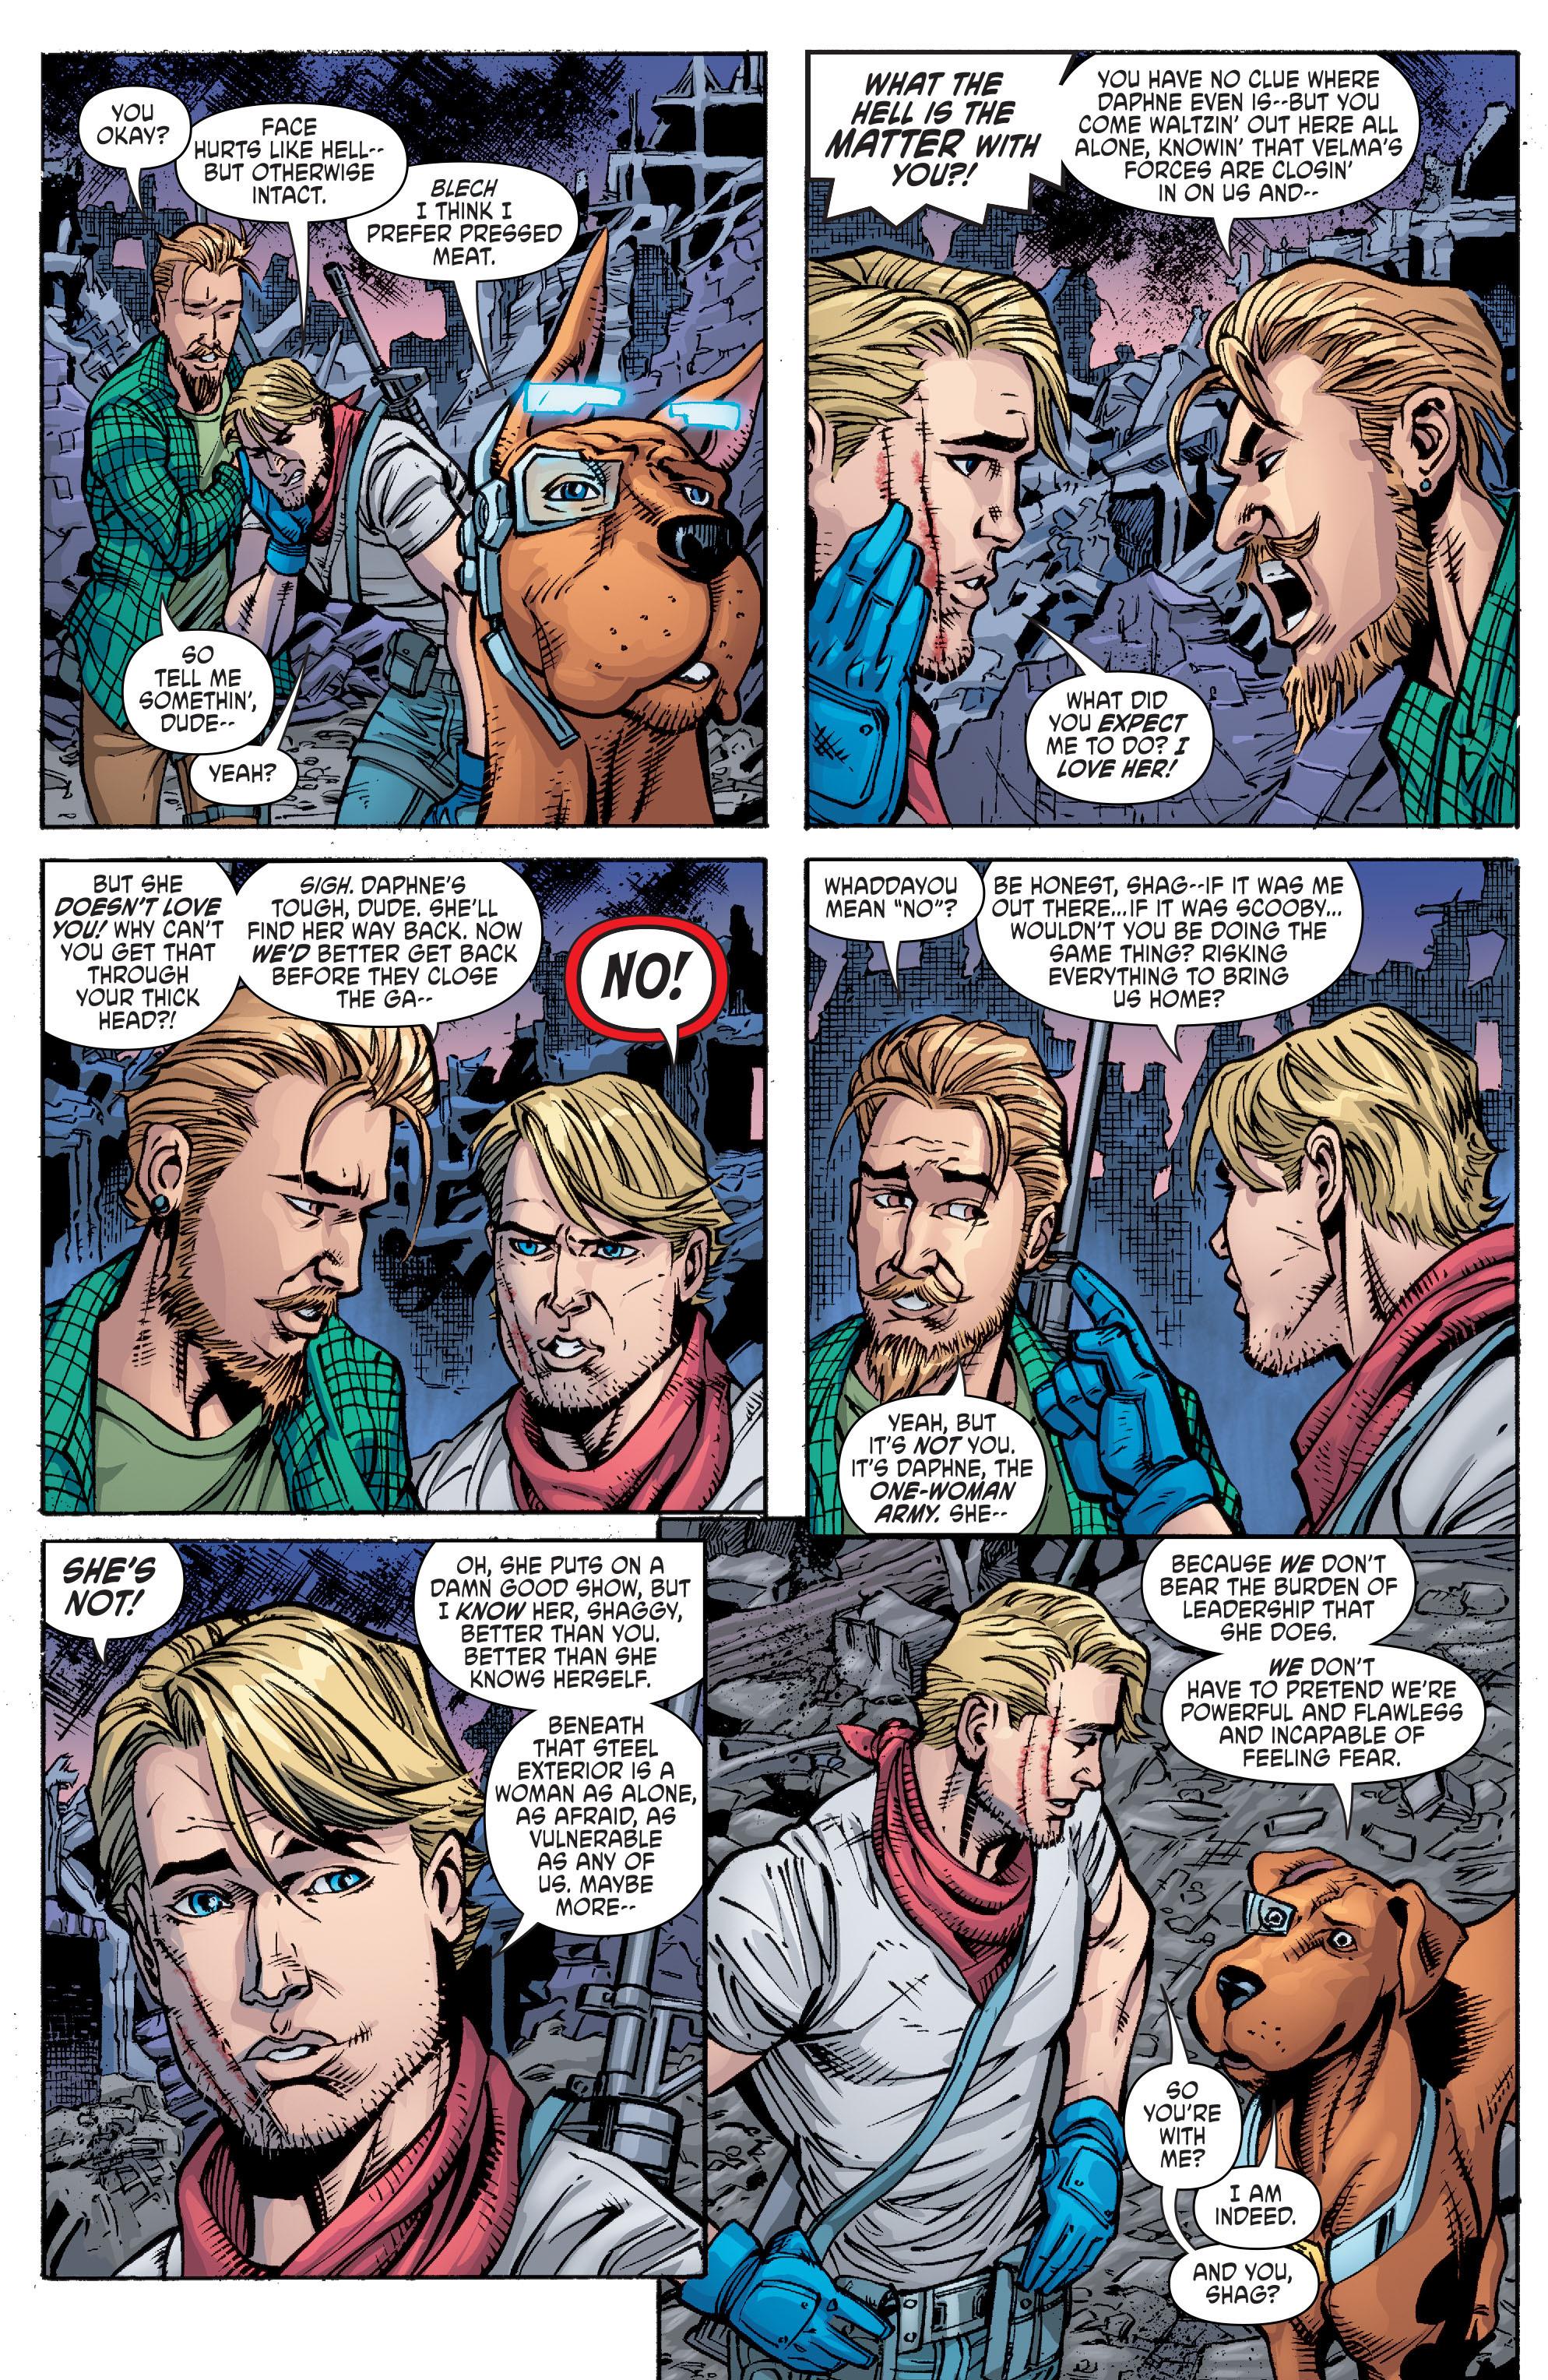 Read online Scooby Apocalypse comic -  Issue #10 - 15